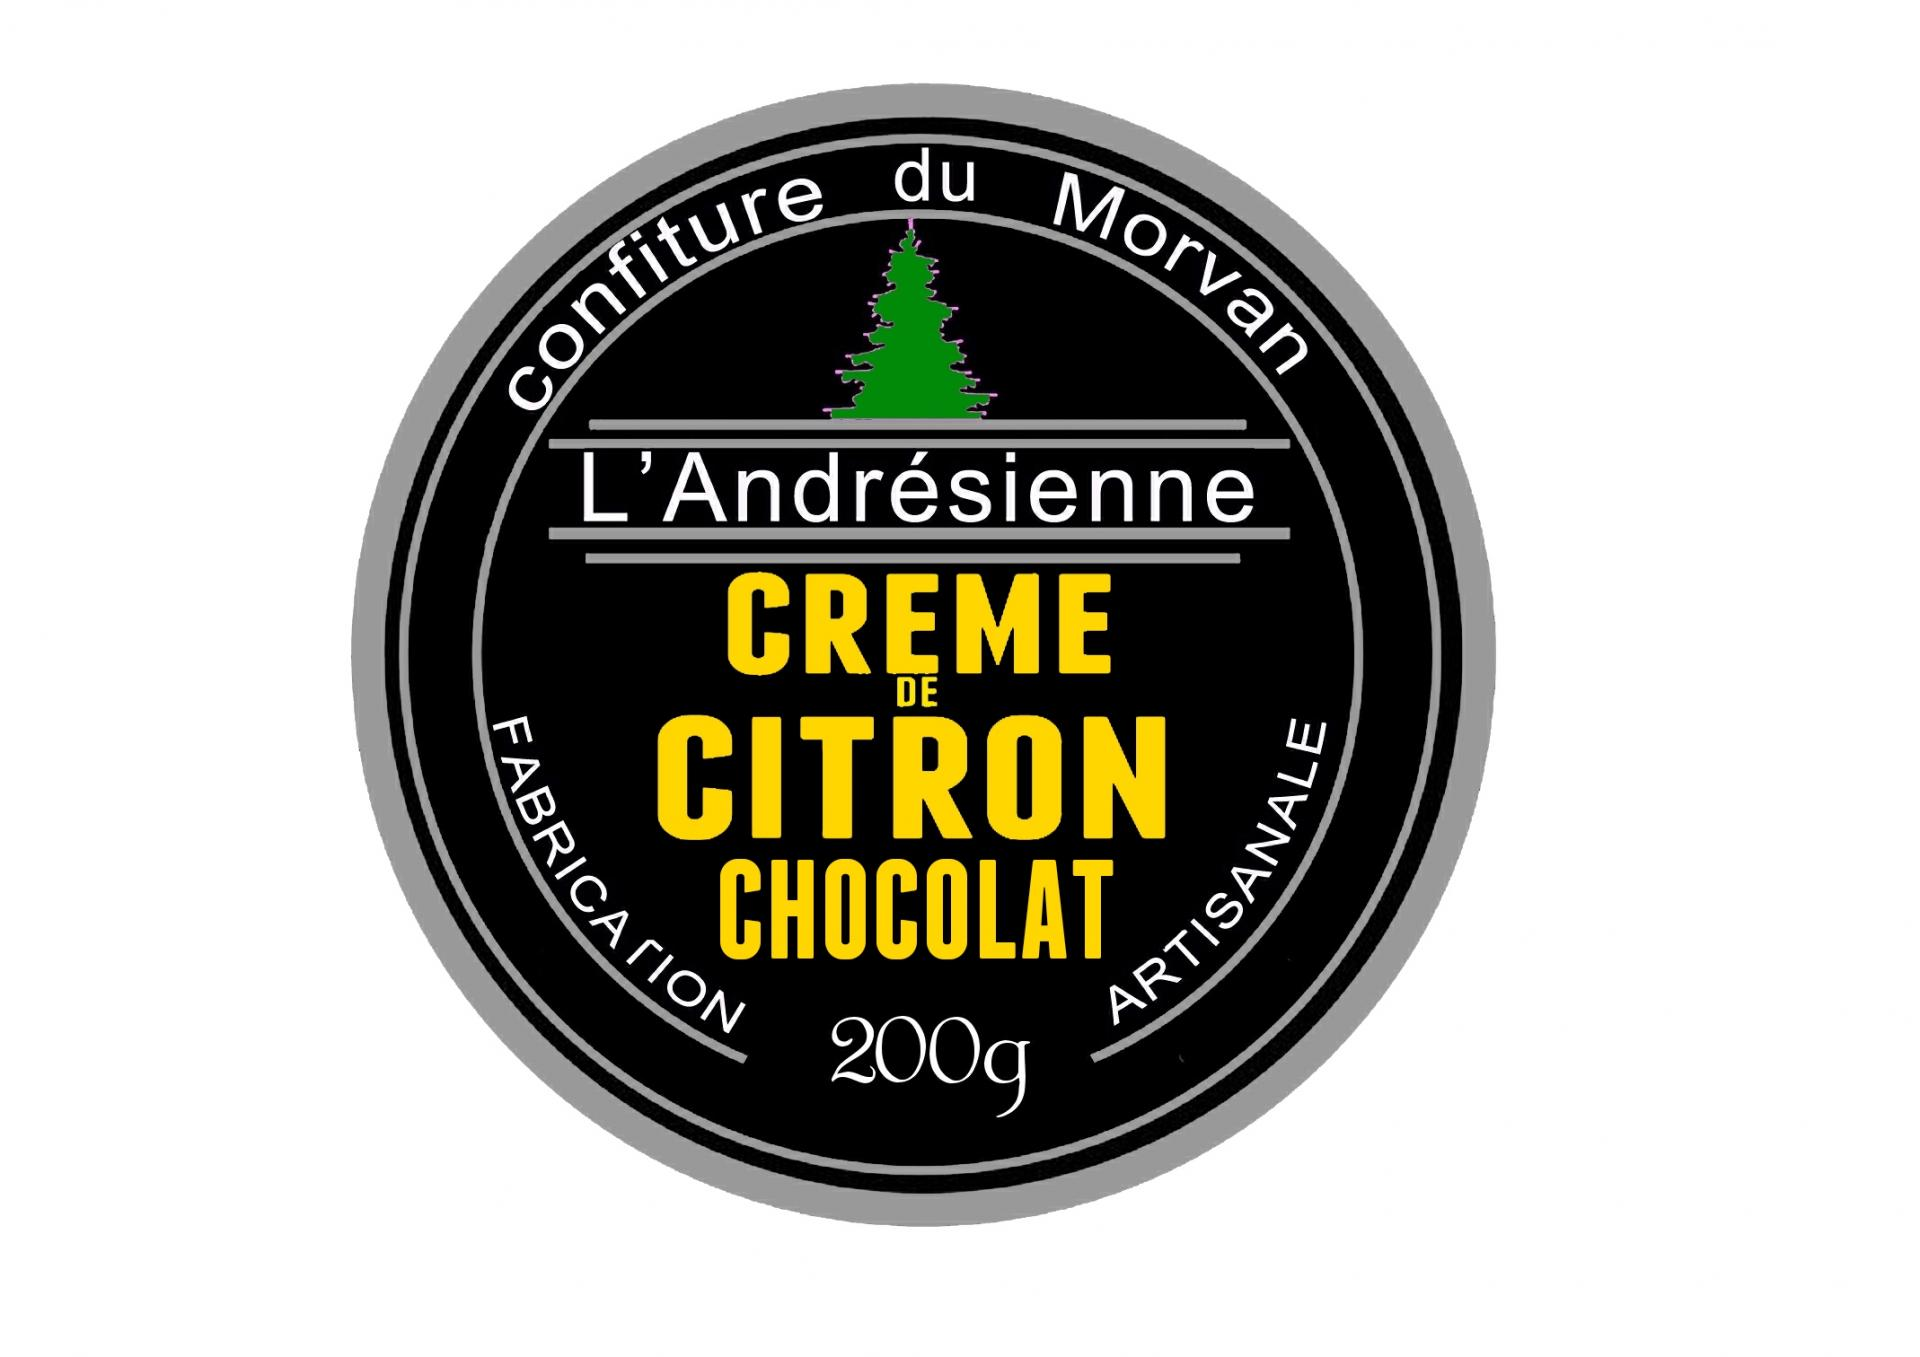 Creme de citron chocolat 01